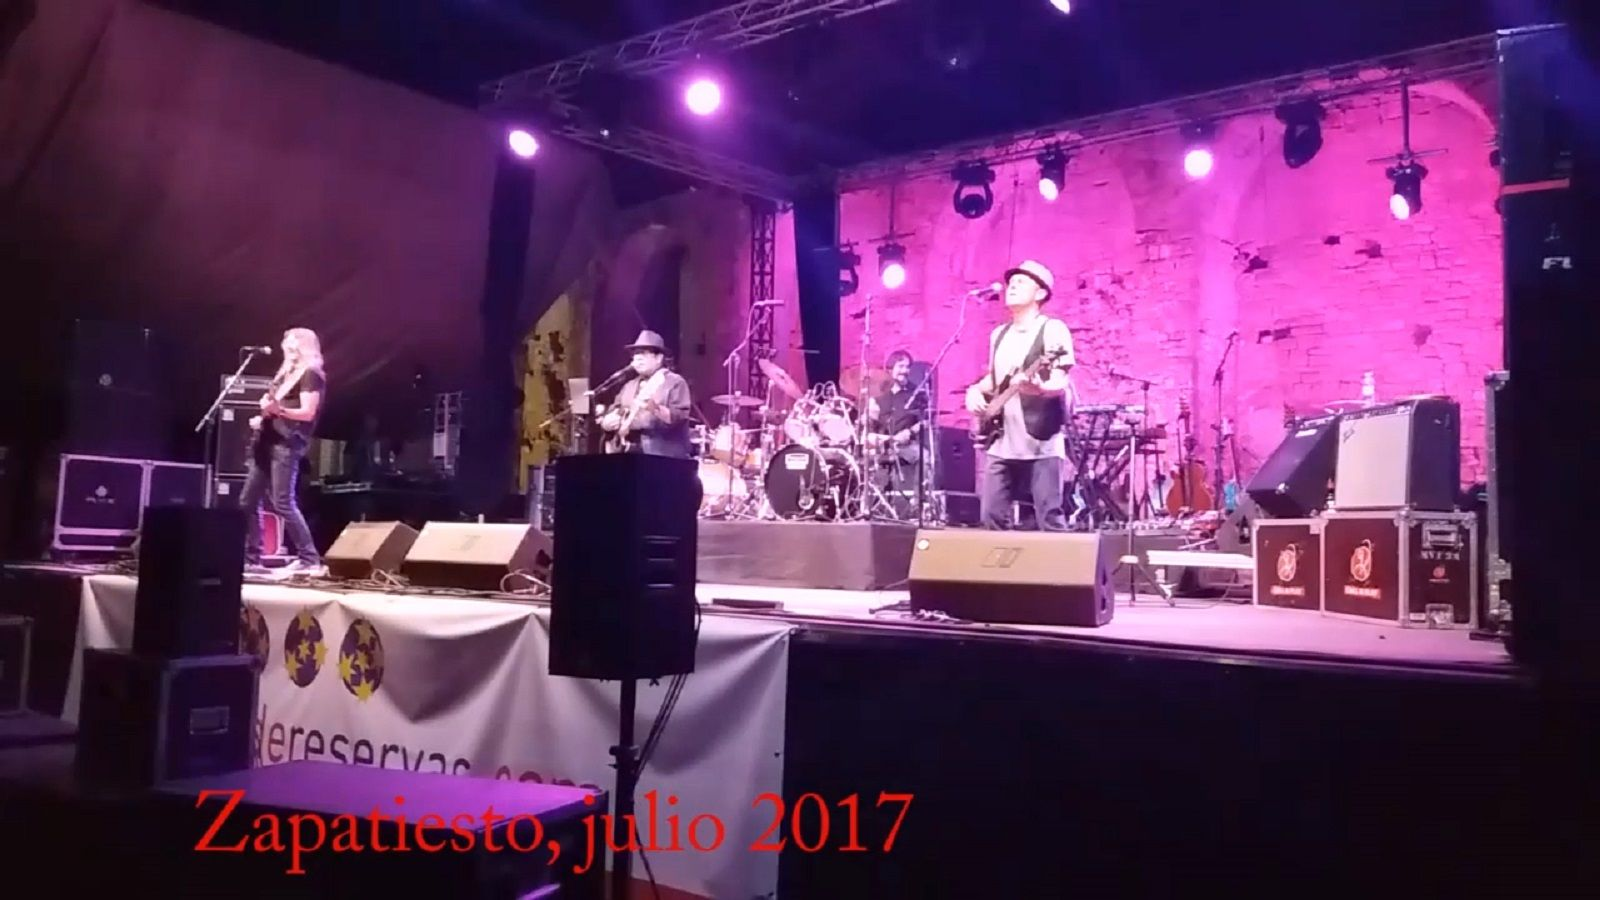 Zapatiesto en julio de 2017. Foto: SobrarbeDigital.